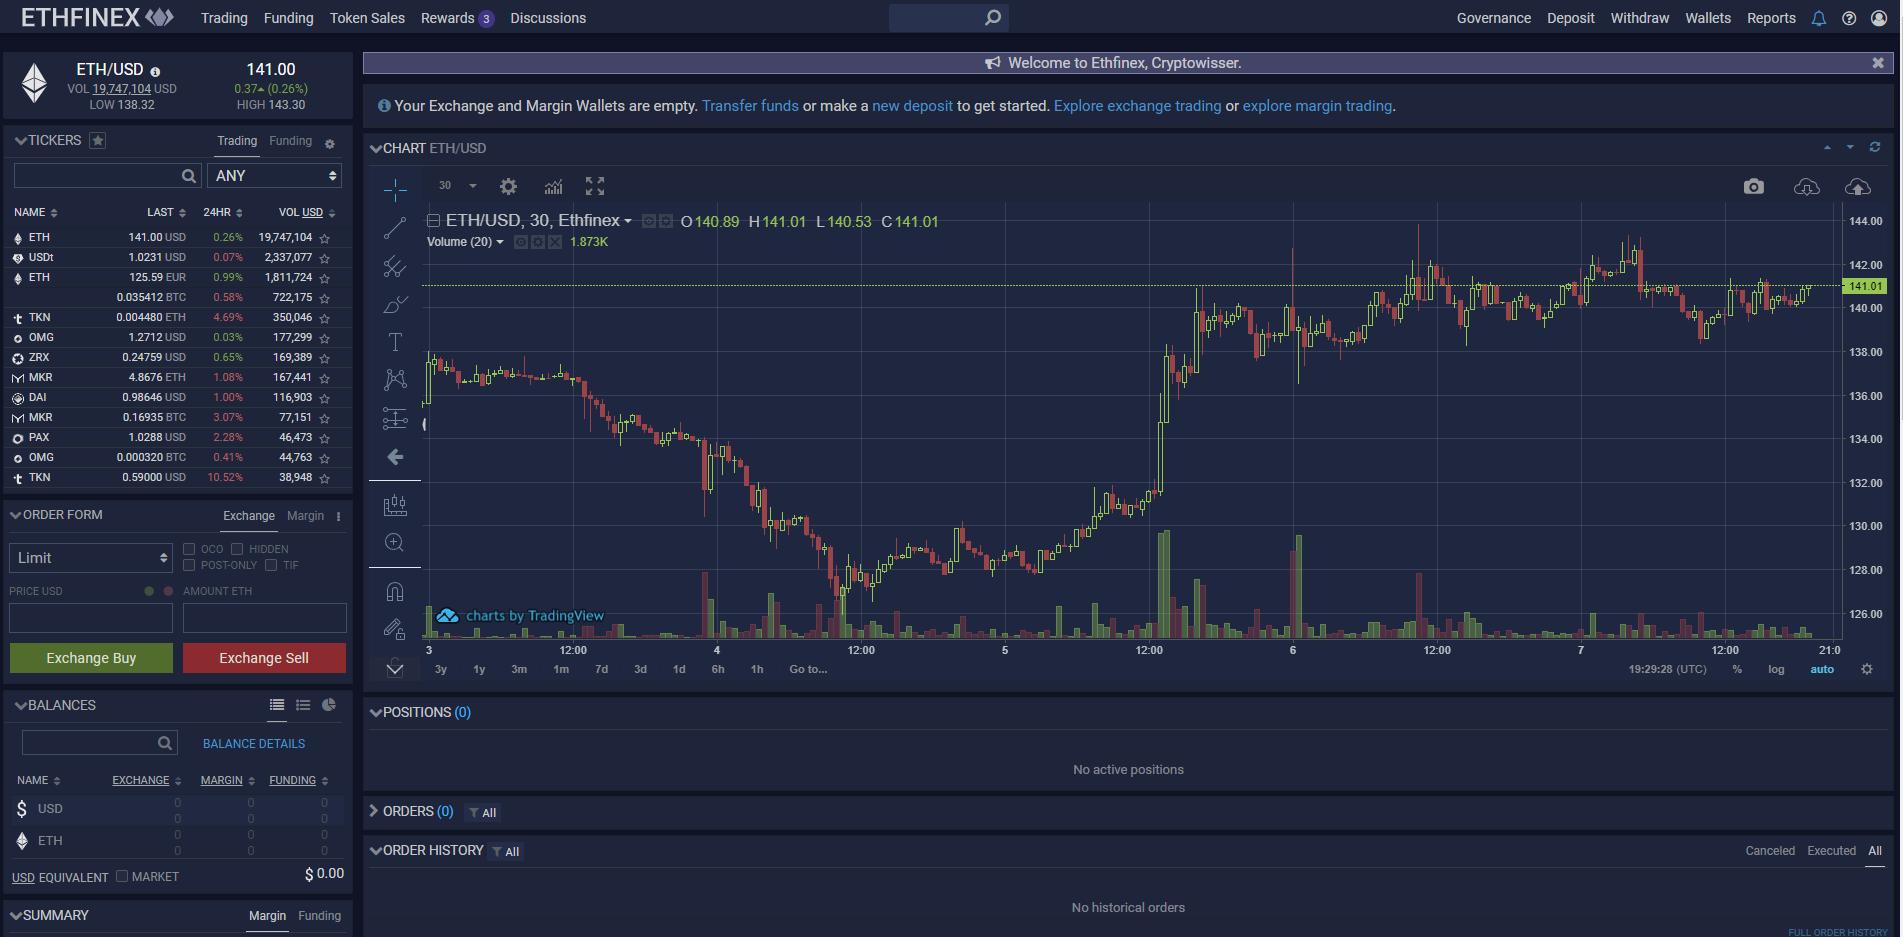 Ethfinex Trading View